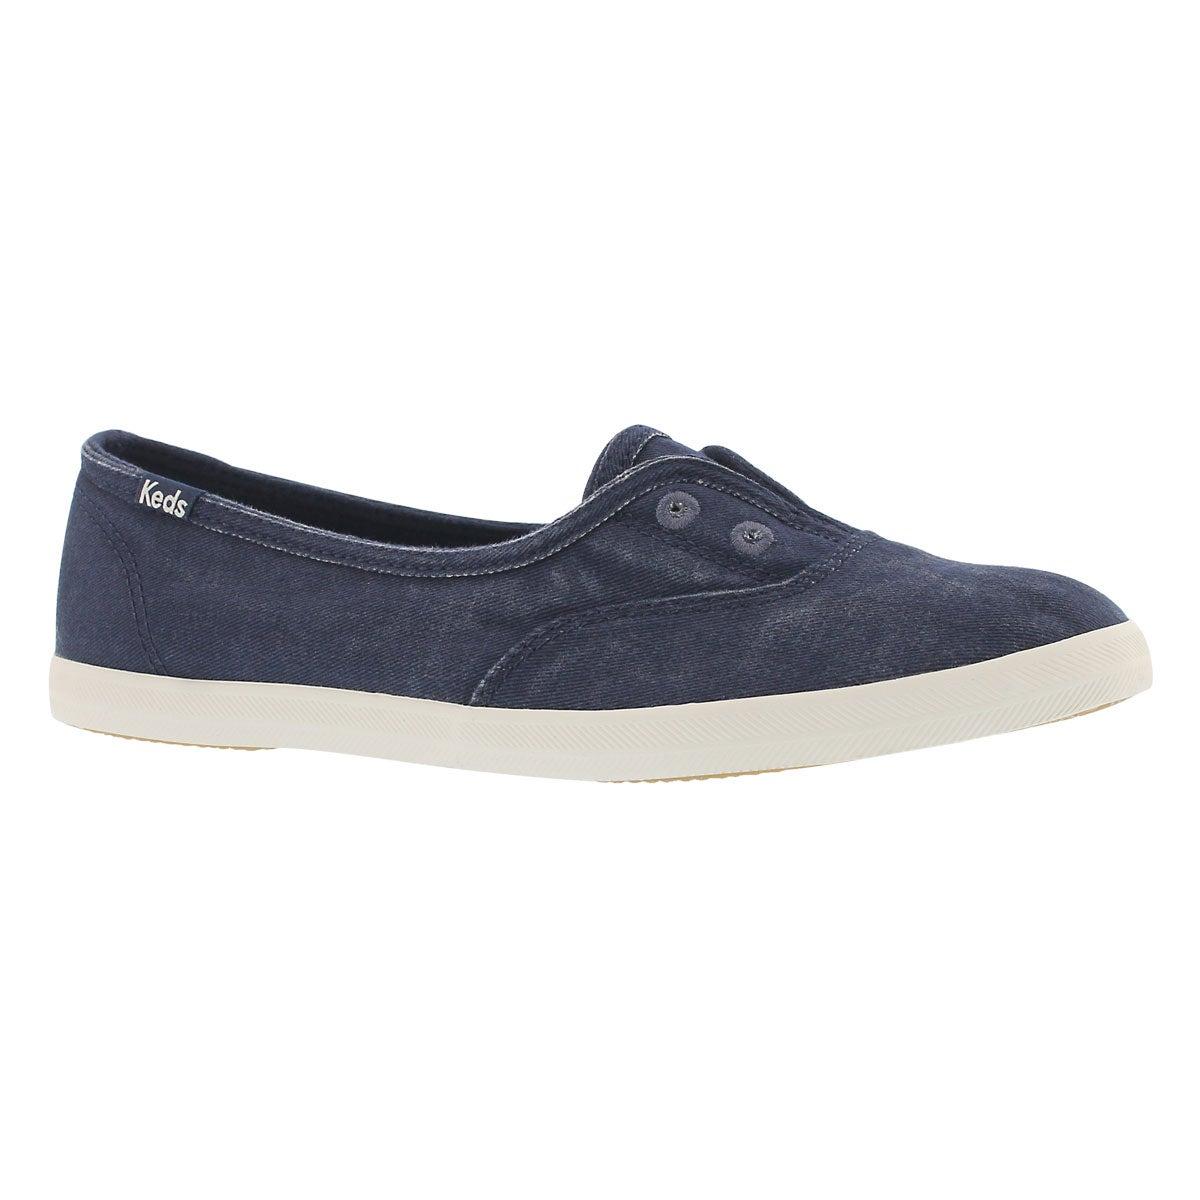 Women's CHILLAX MINI navy sneakers